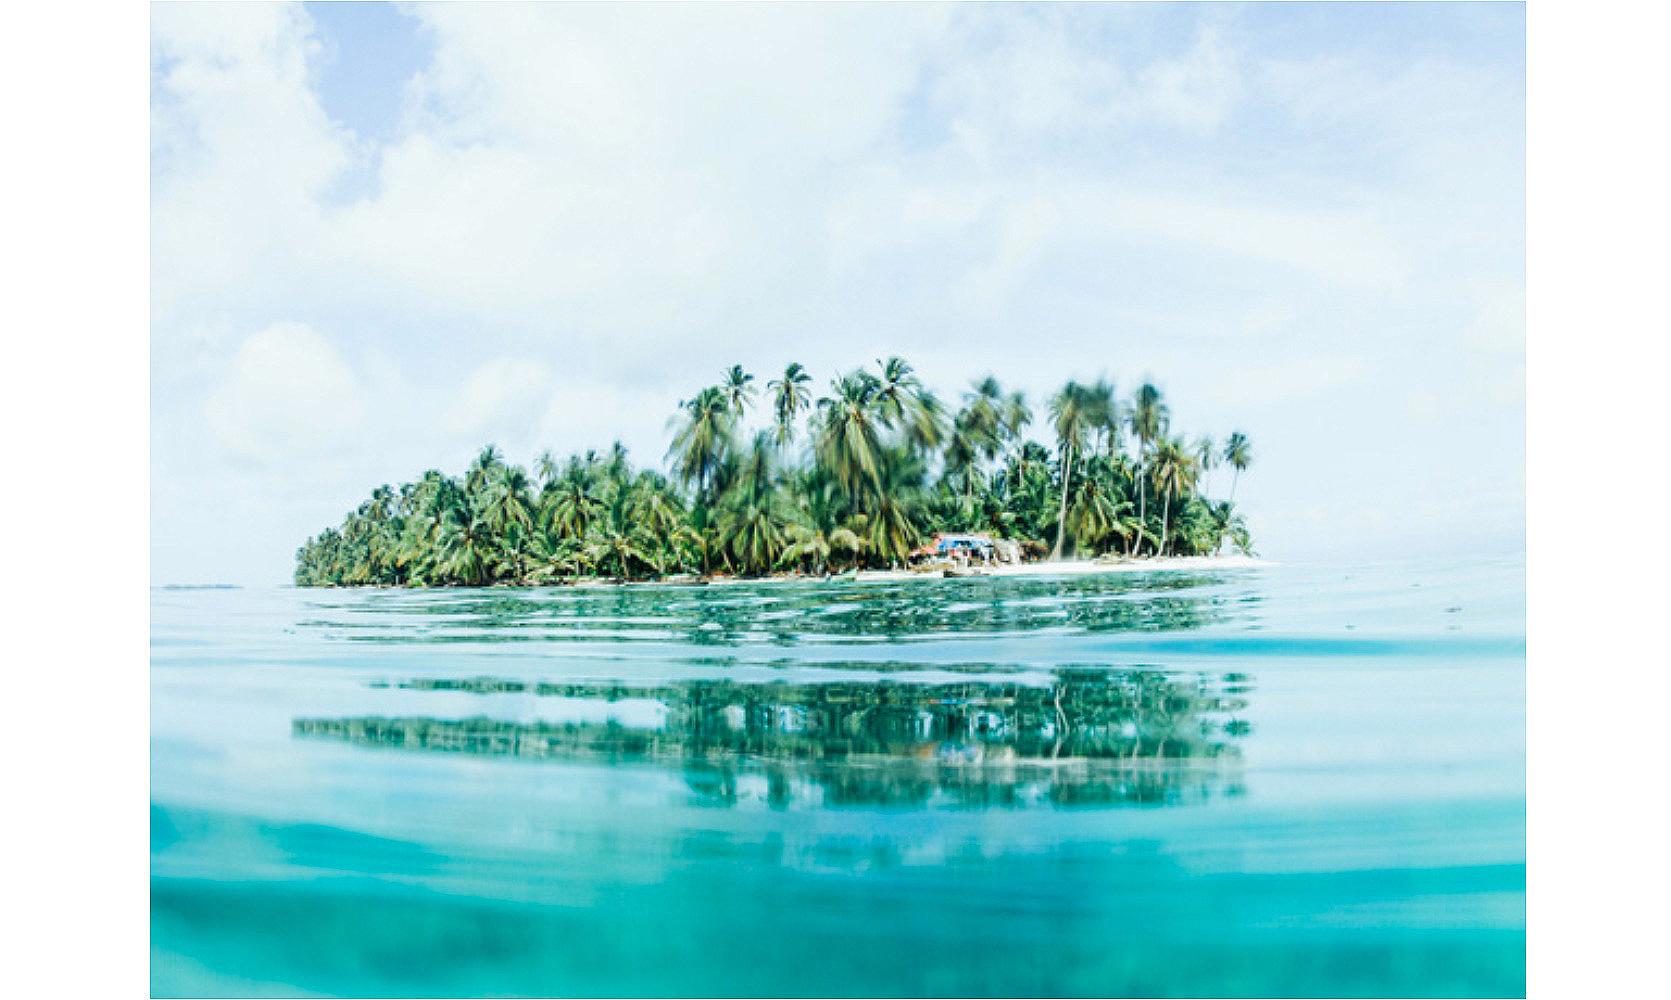 island-shot-at-water-level.jpg